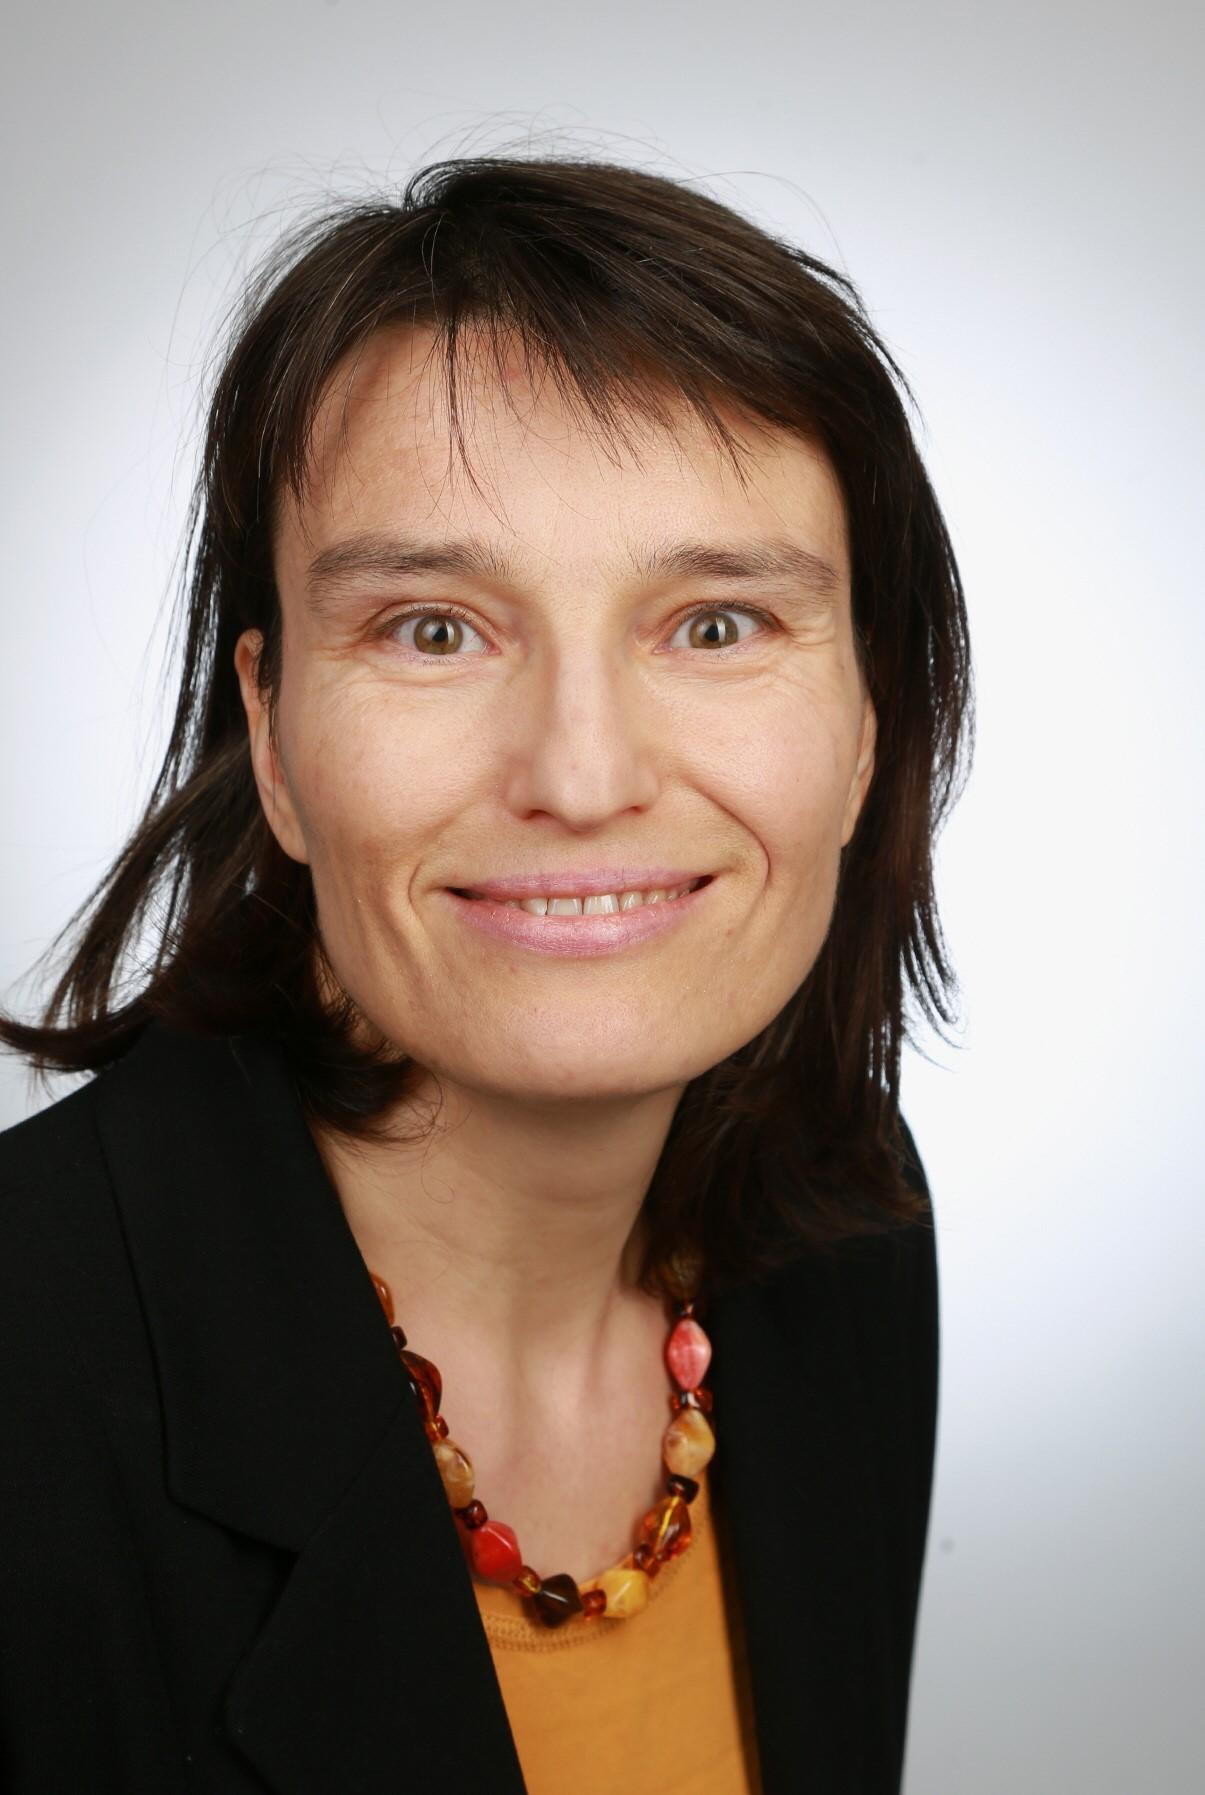 Karin Luebsen